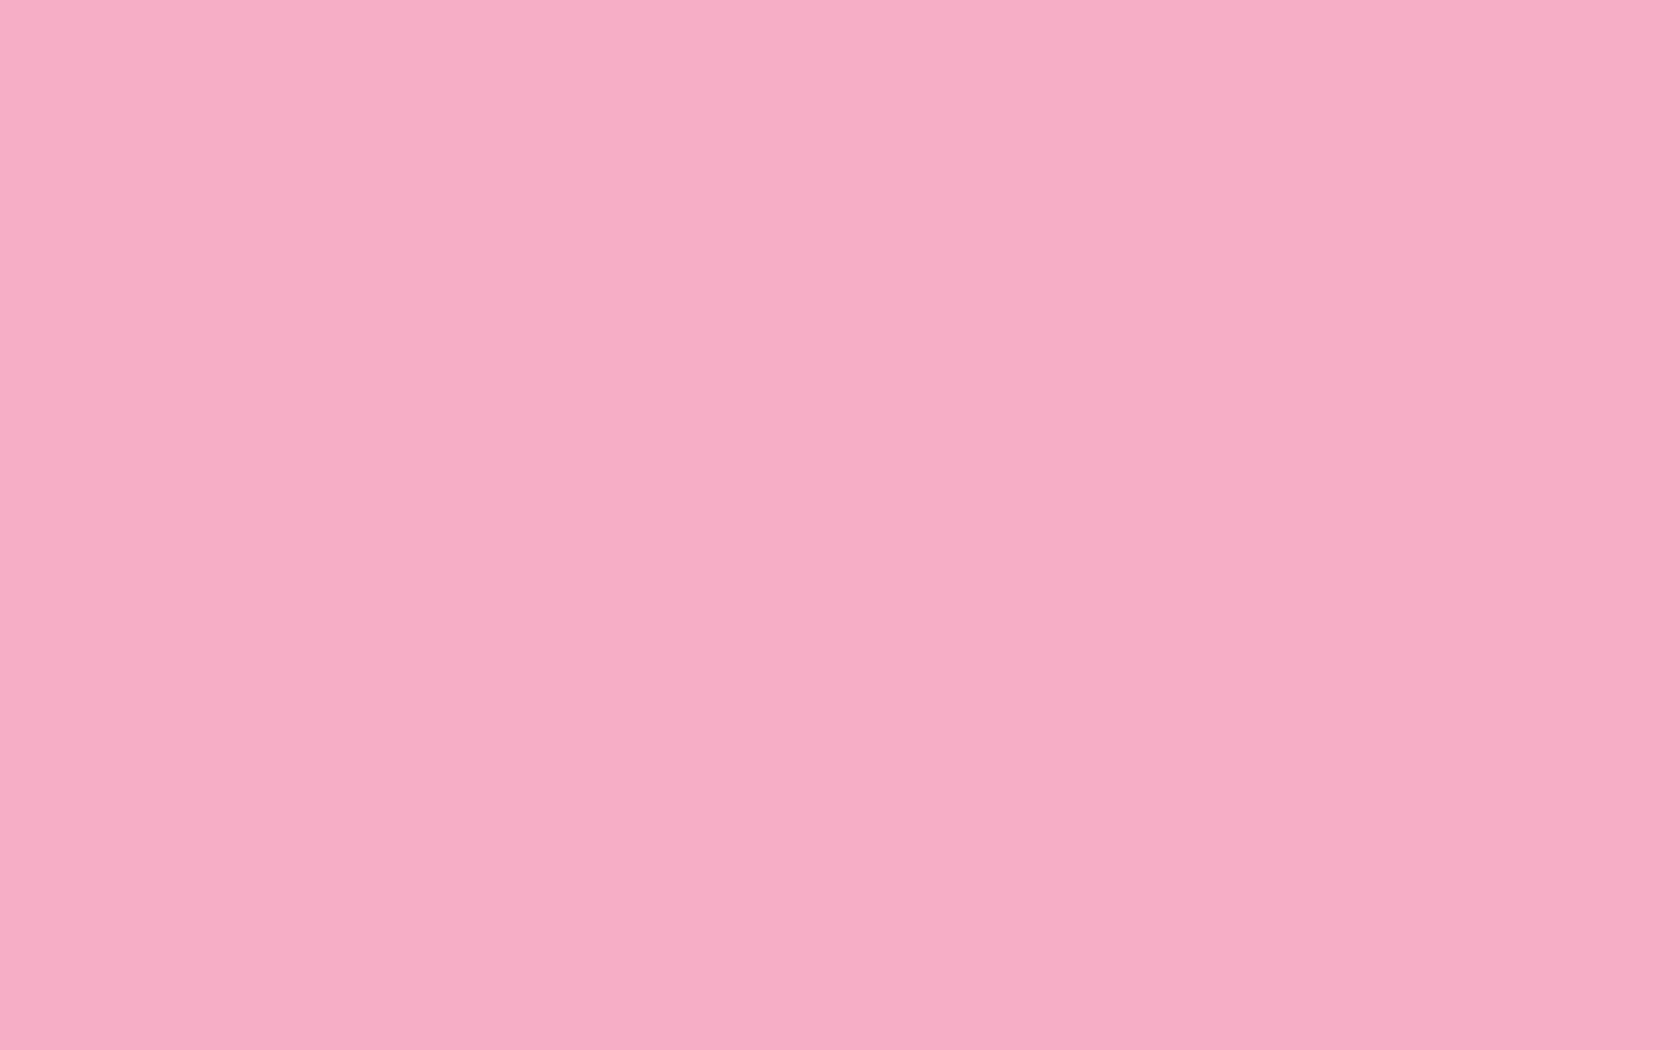 1680x1050 Nadeshiko Pink Solid Color Background